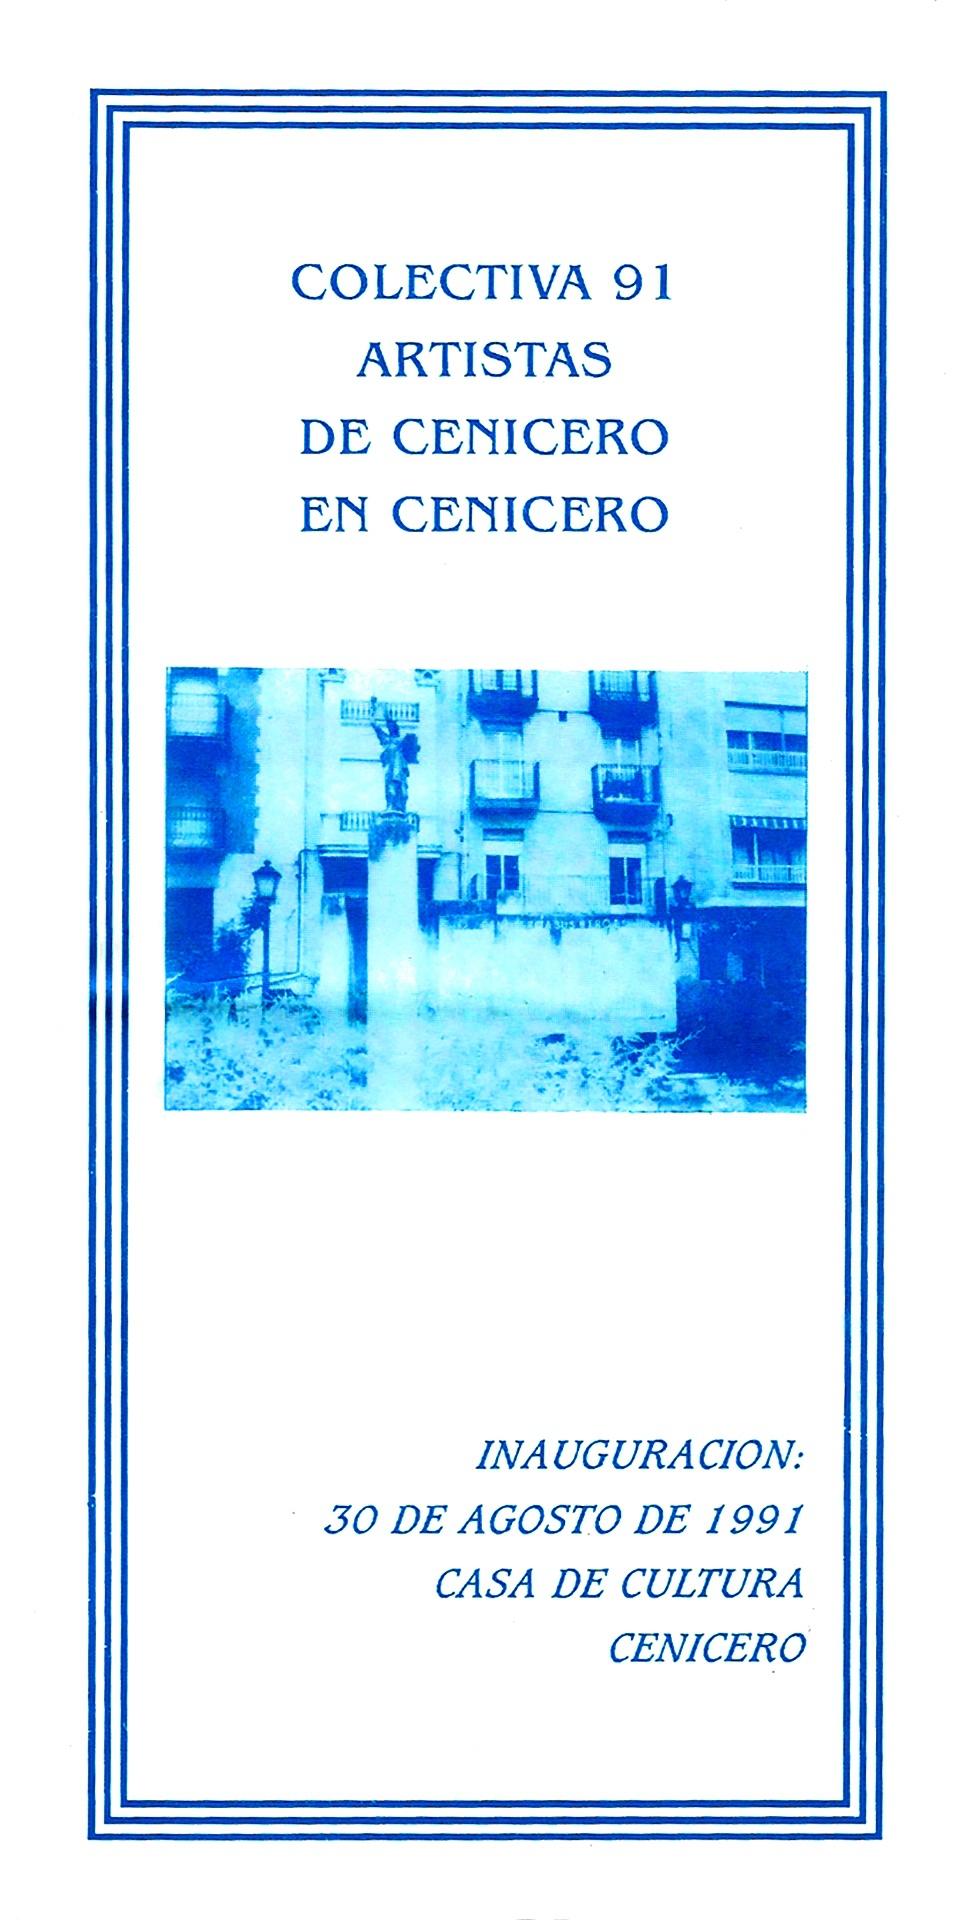 Colectiva 91 - Pako Campo